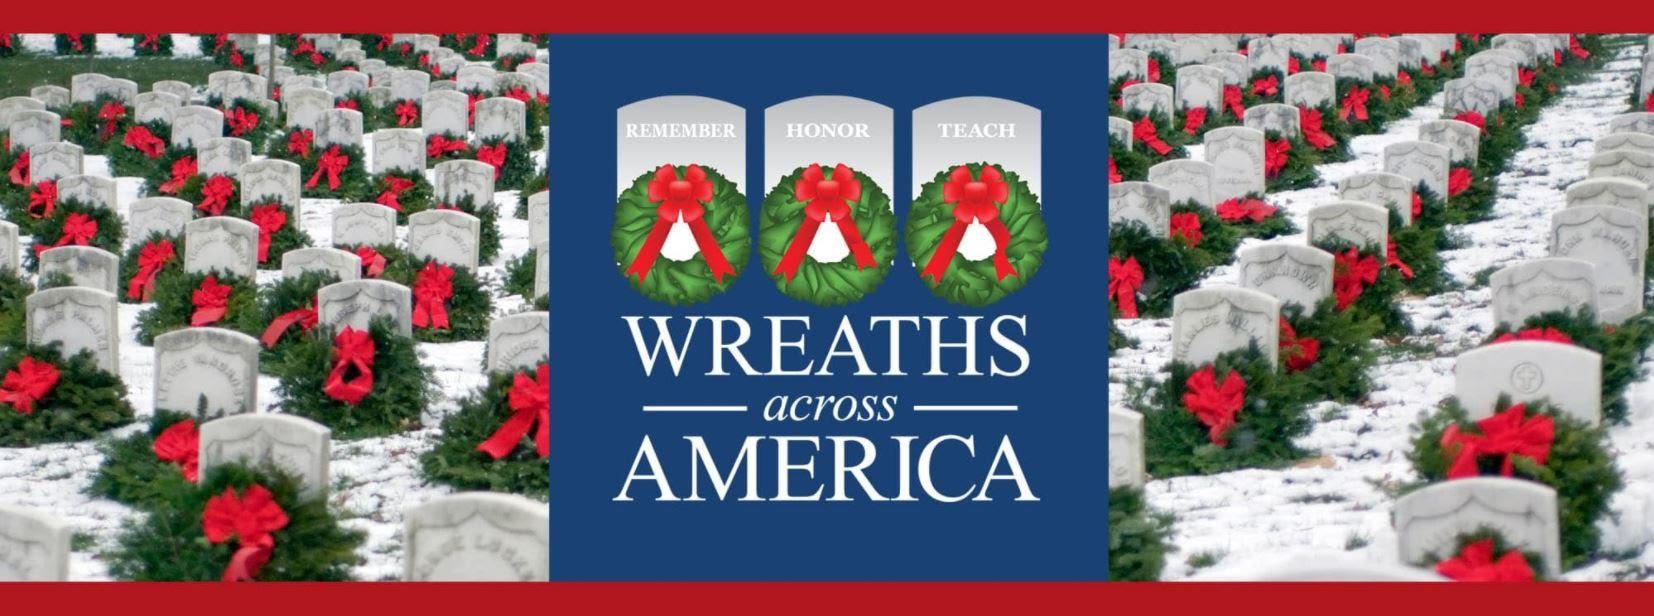 Wreaths Across America - Sponsor Arlington Composite Squadron